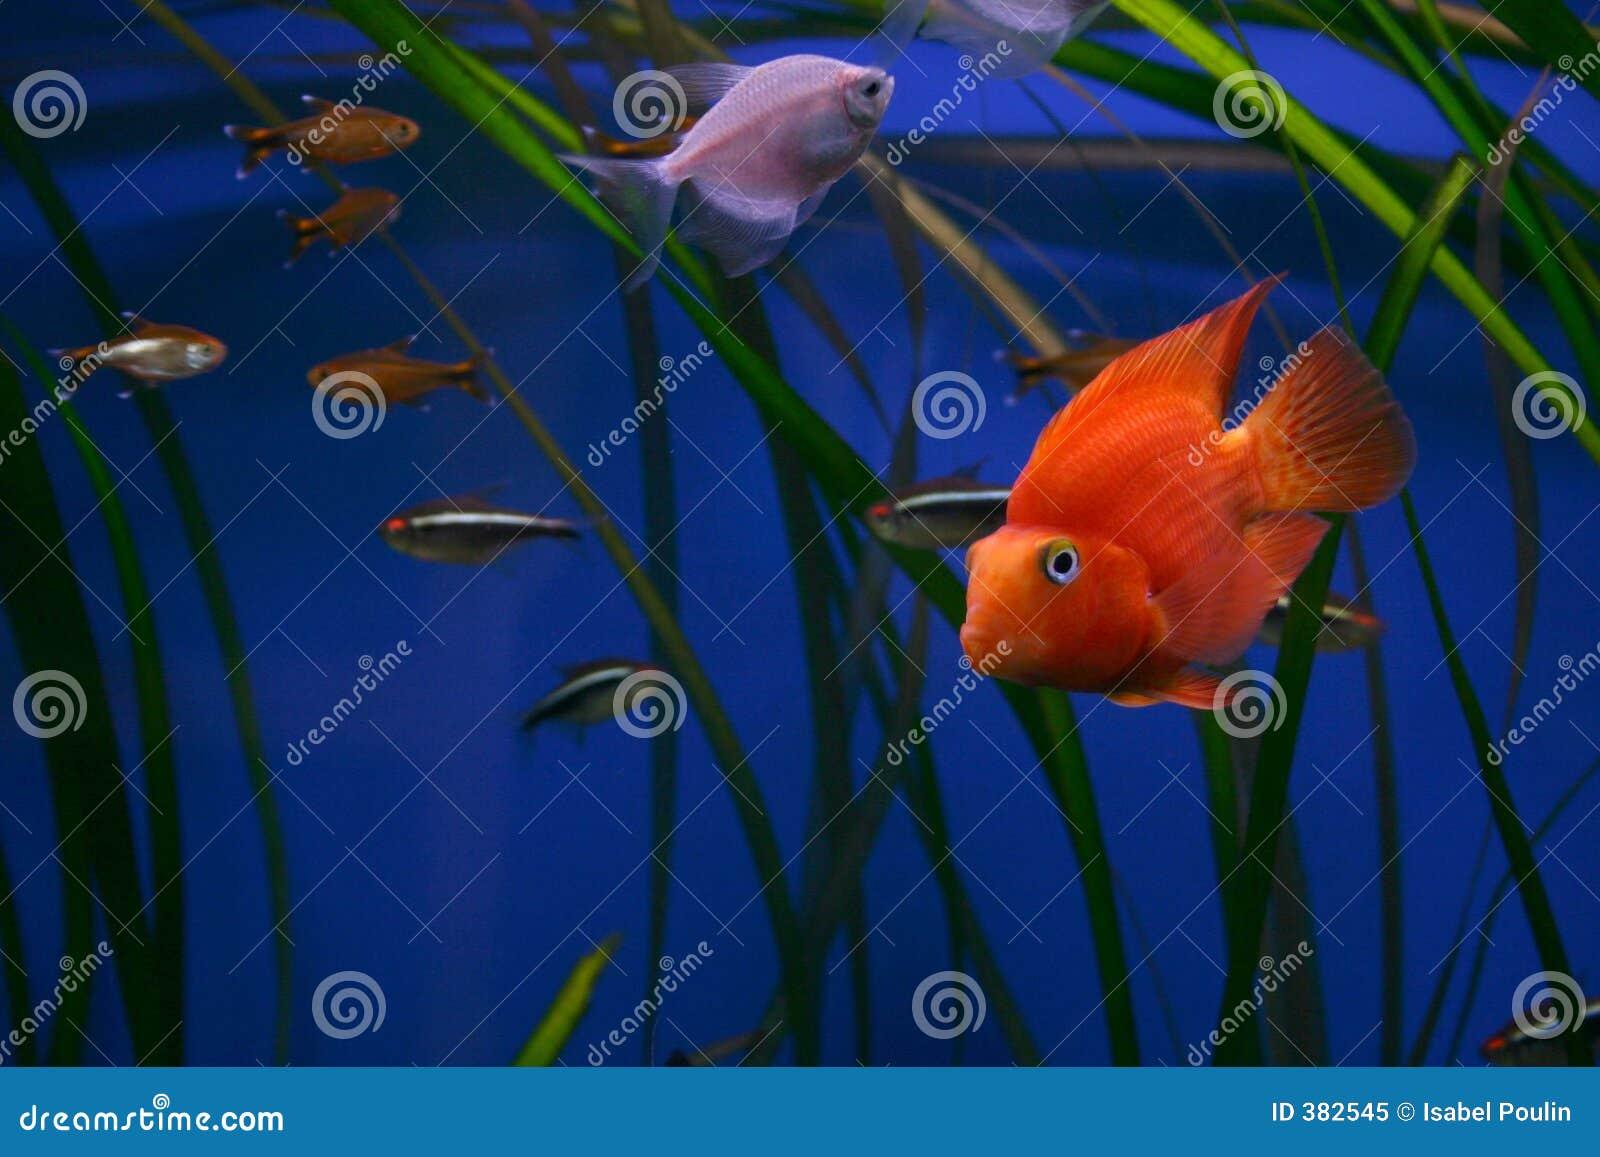 Colorful Aquarium Fish Royalty Free Stock Photo Image